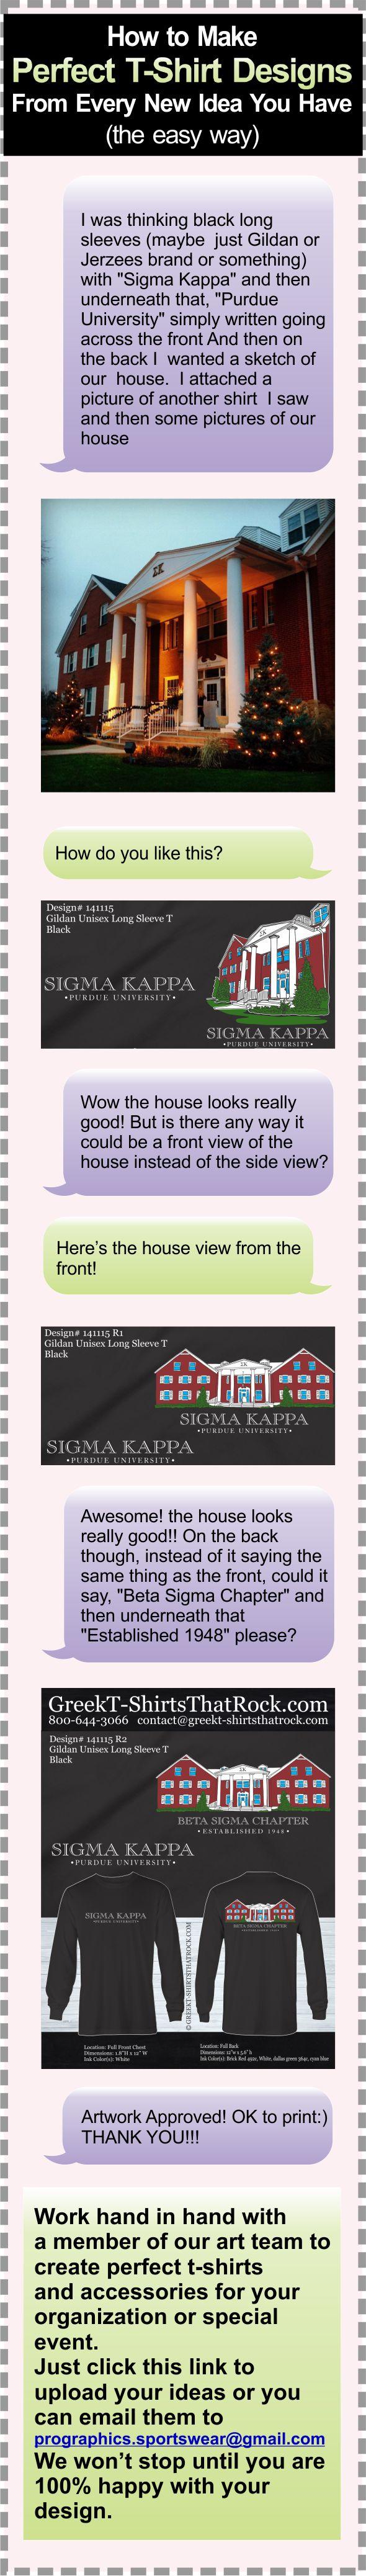 Color printing purdue - Sigma Kappa Purdue University